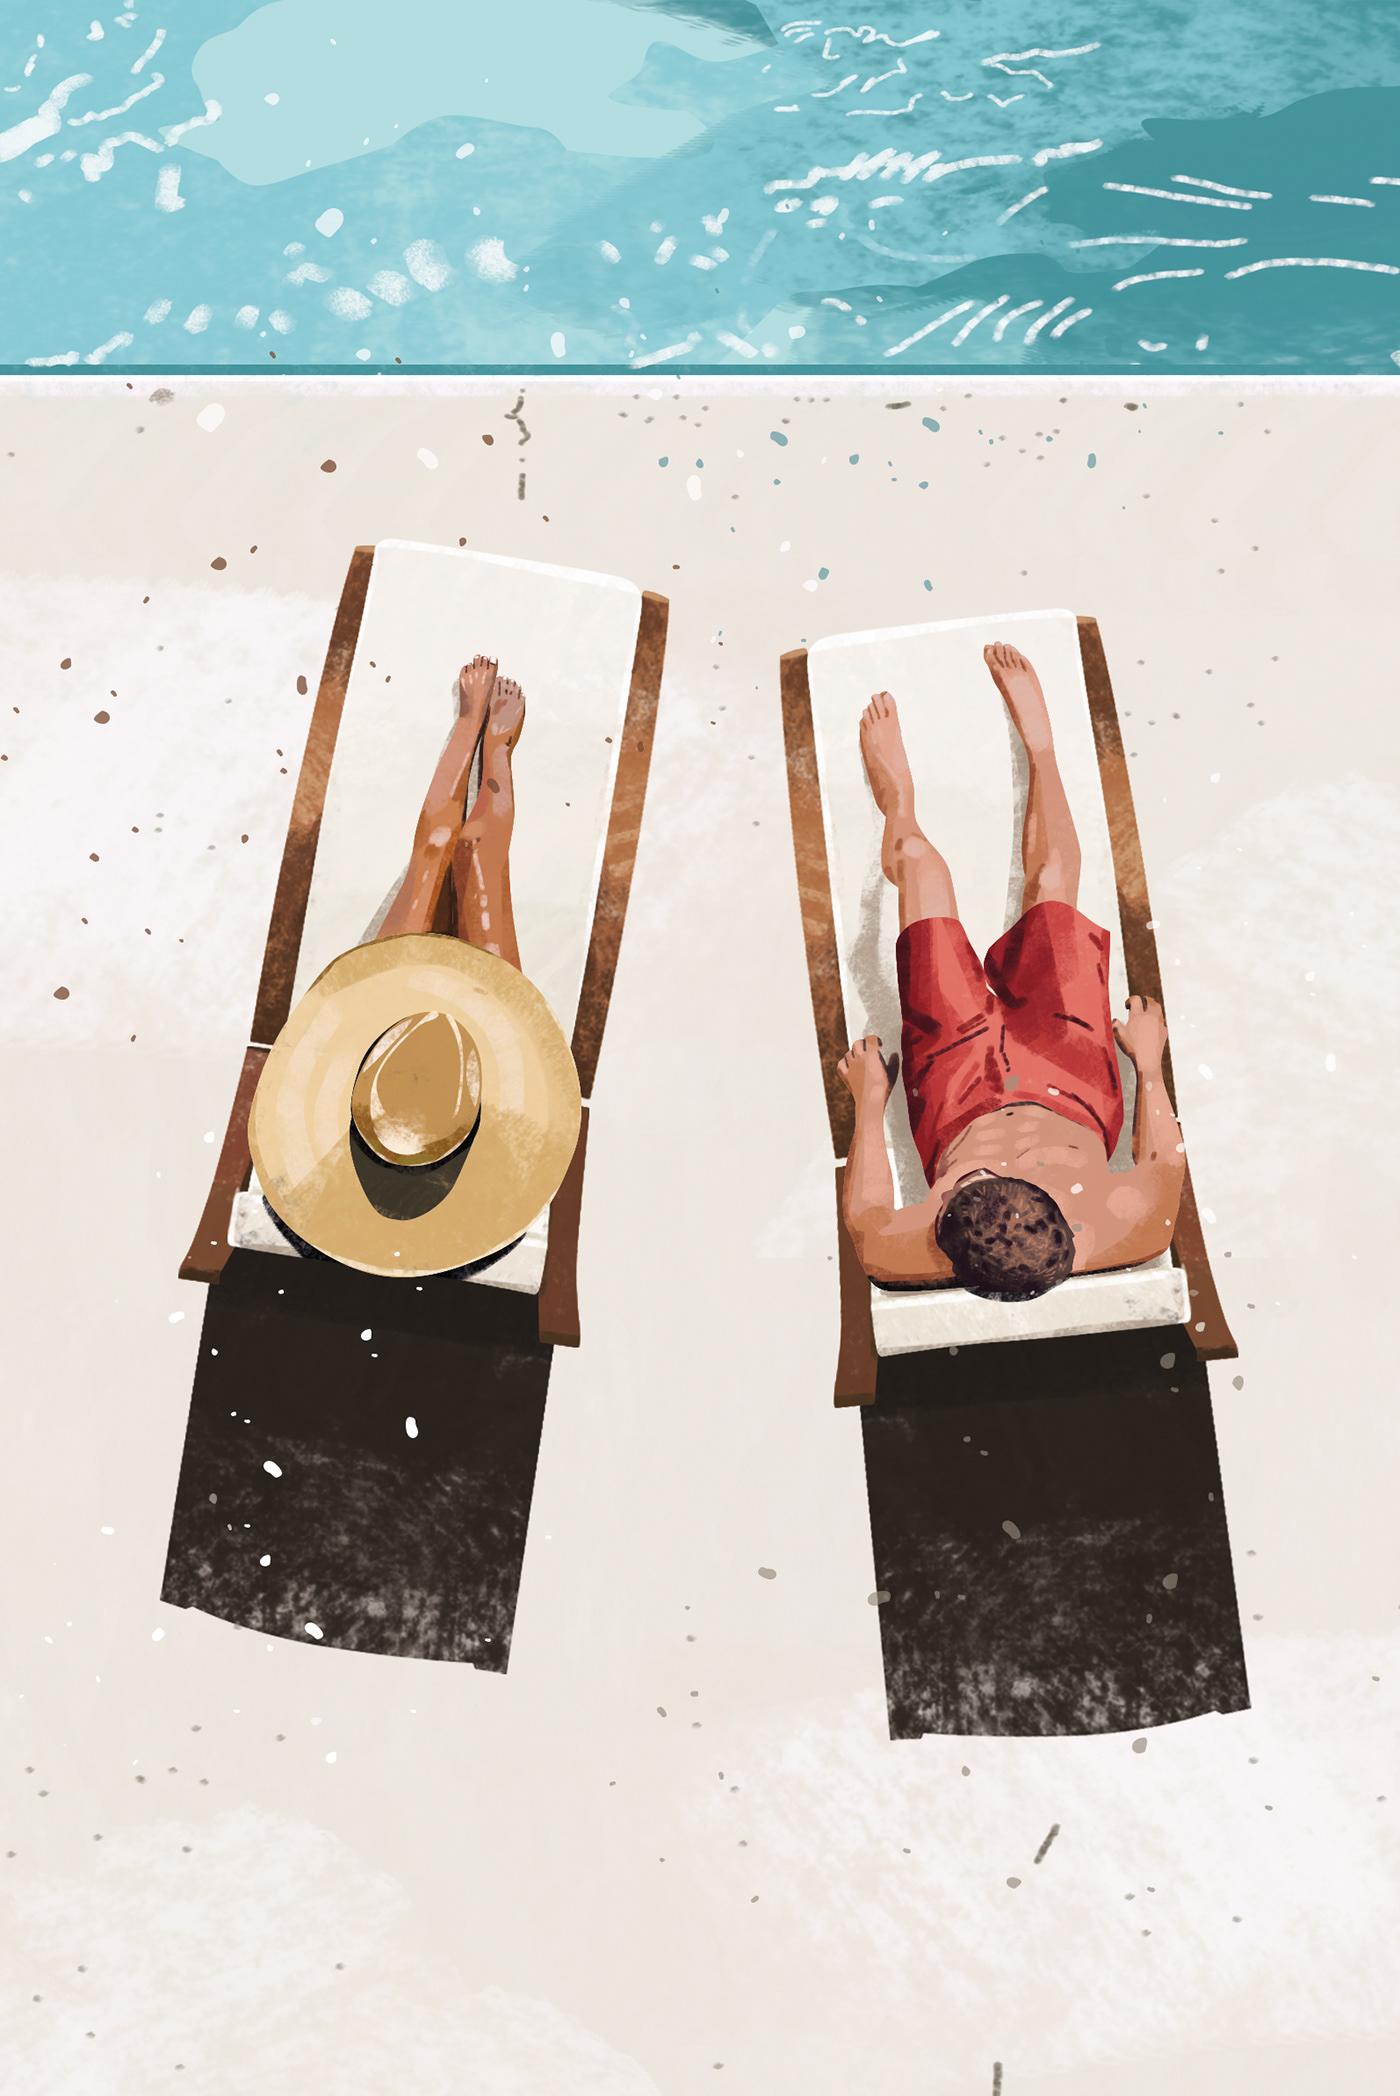 adobe art creative digitalart Drawing  editorial ILLUSTRATION  painting   Pool summer